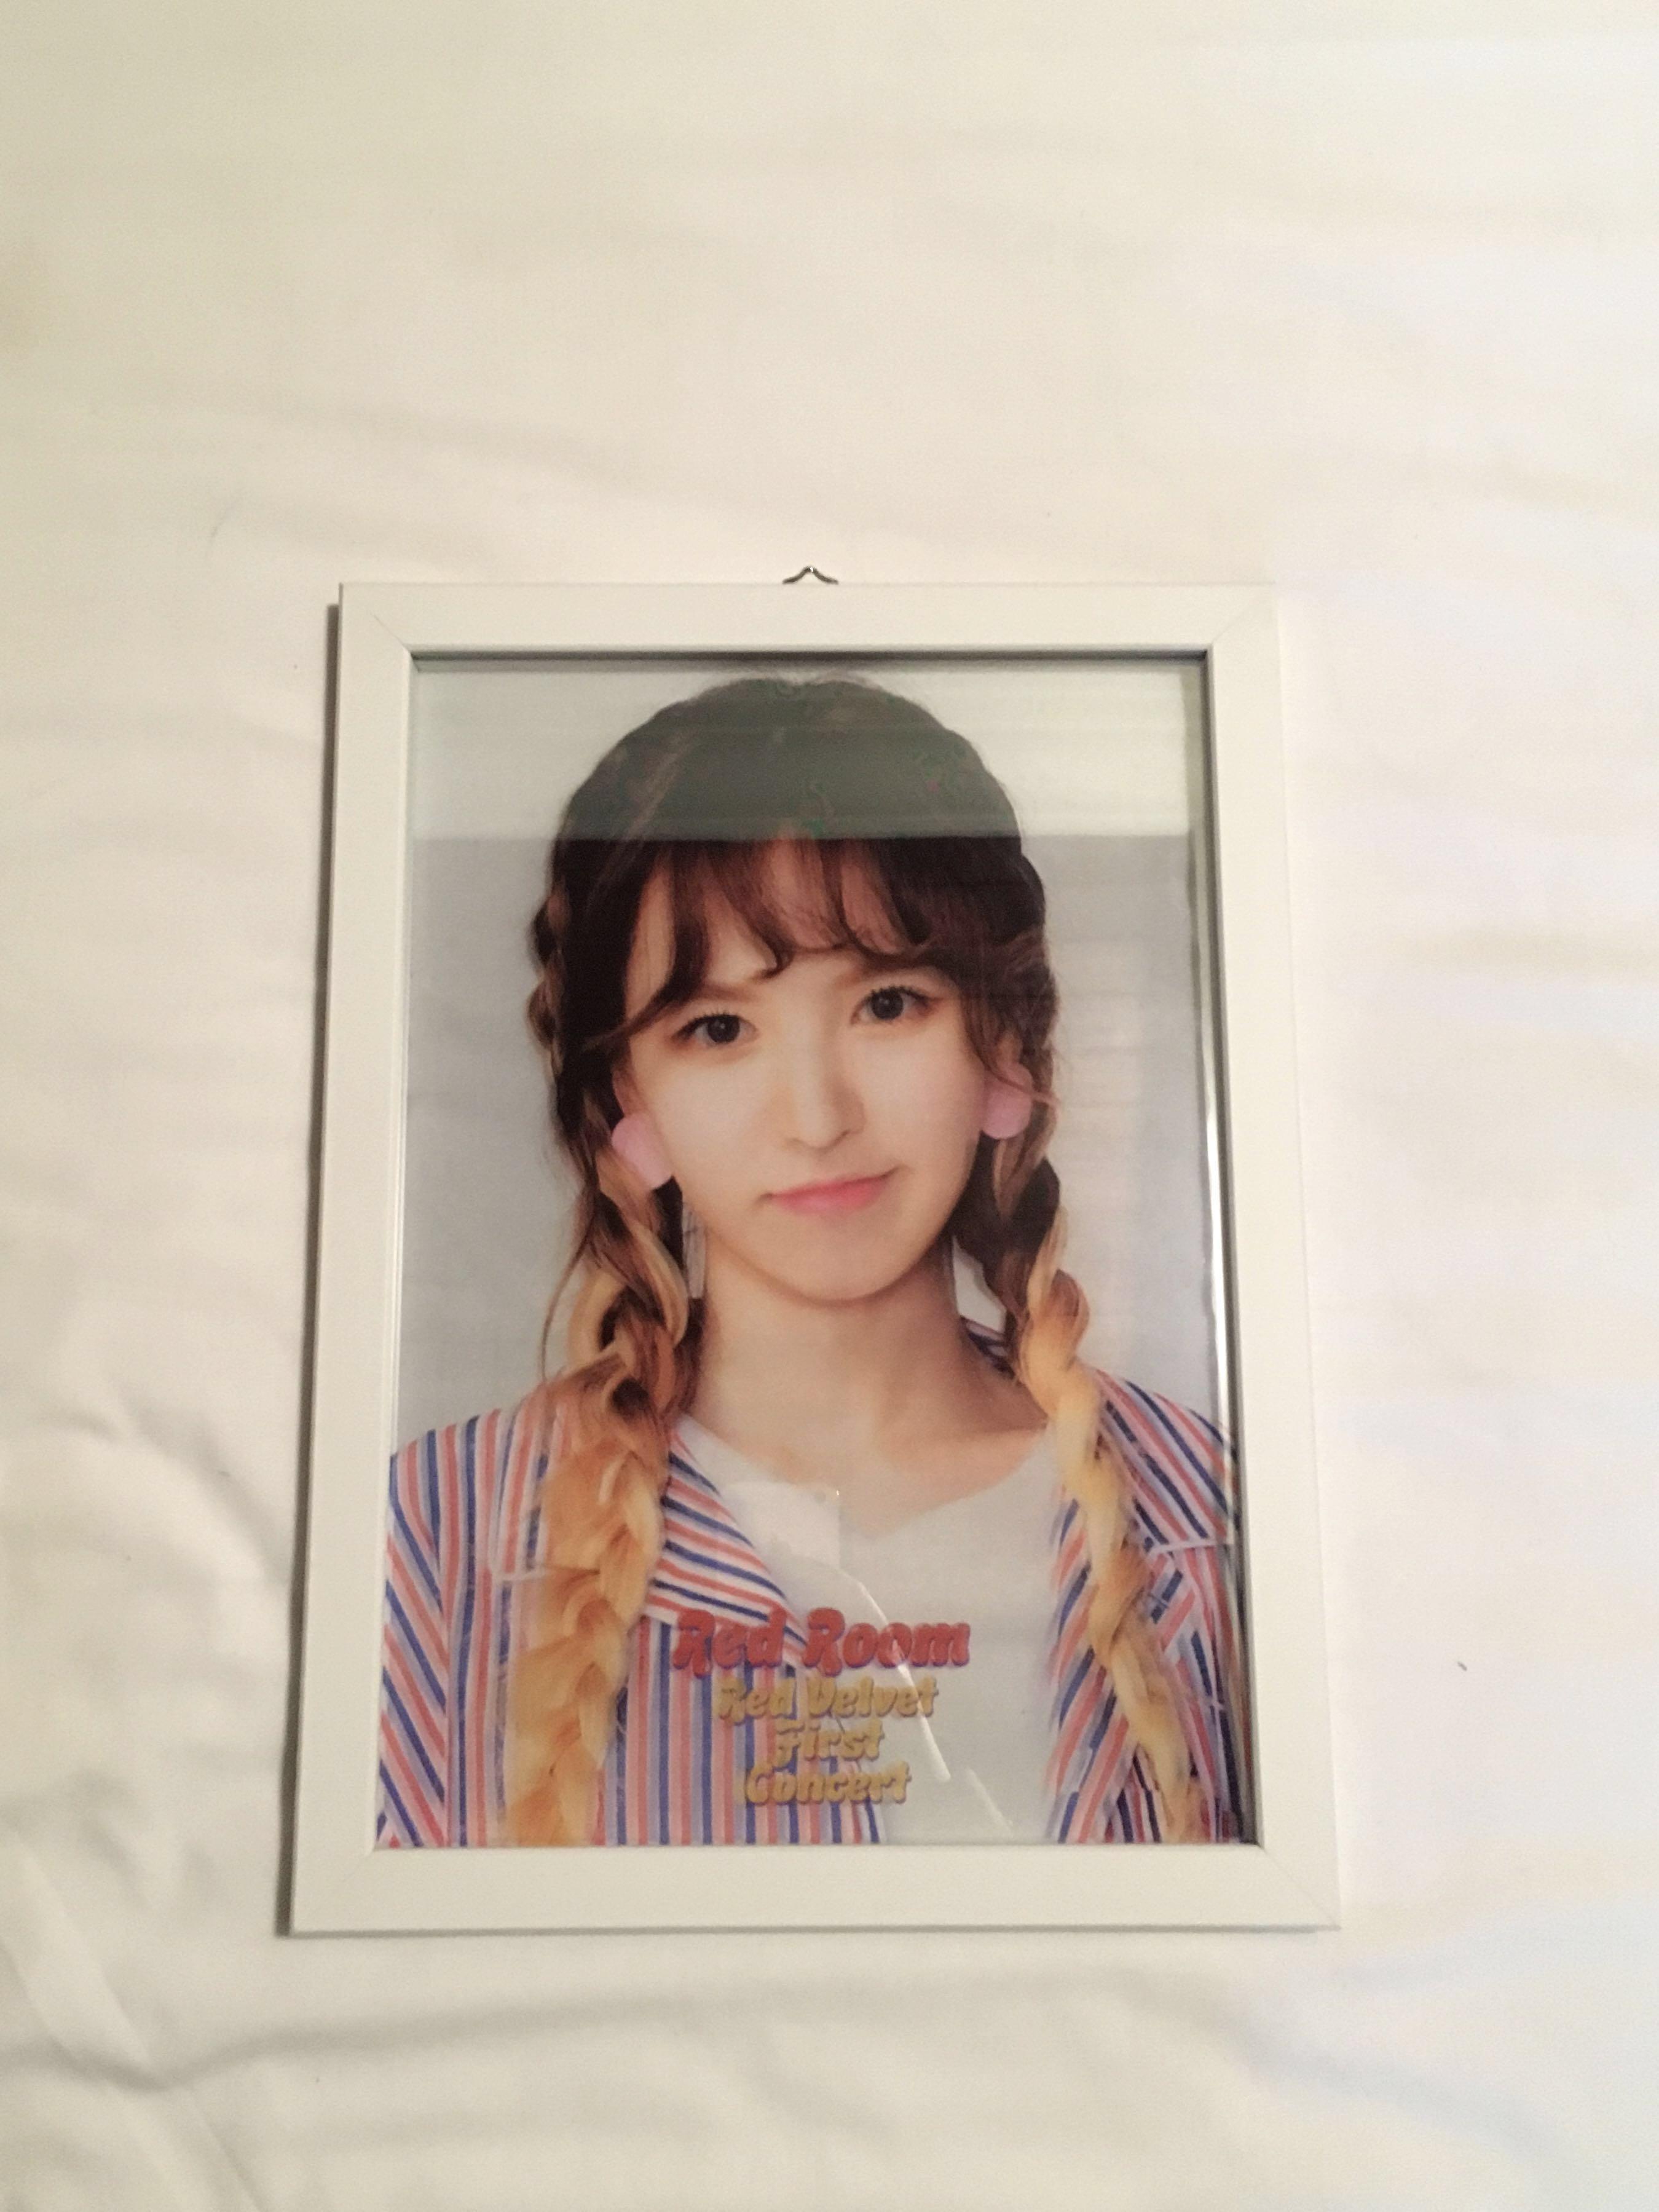 [WTS] Official Red Velvet 1st Concert Red Room - Transparent Photo Frame (WENDY ver.)